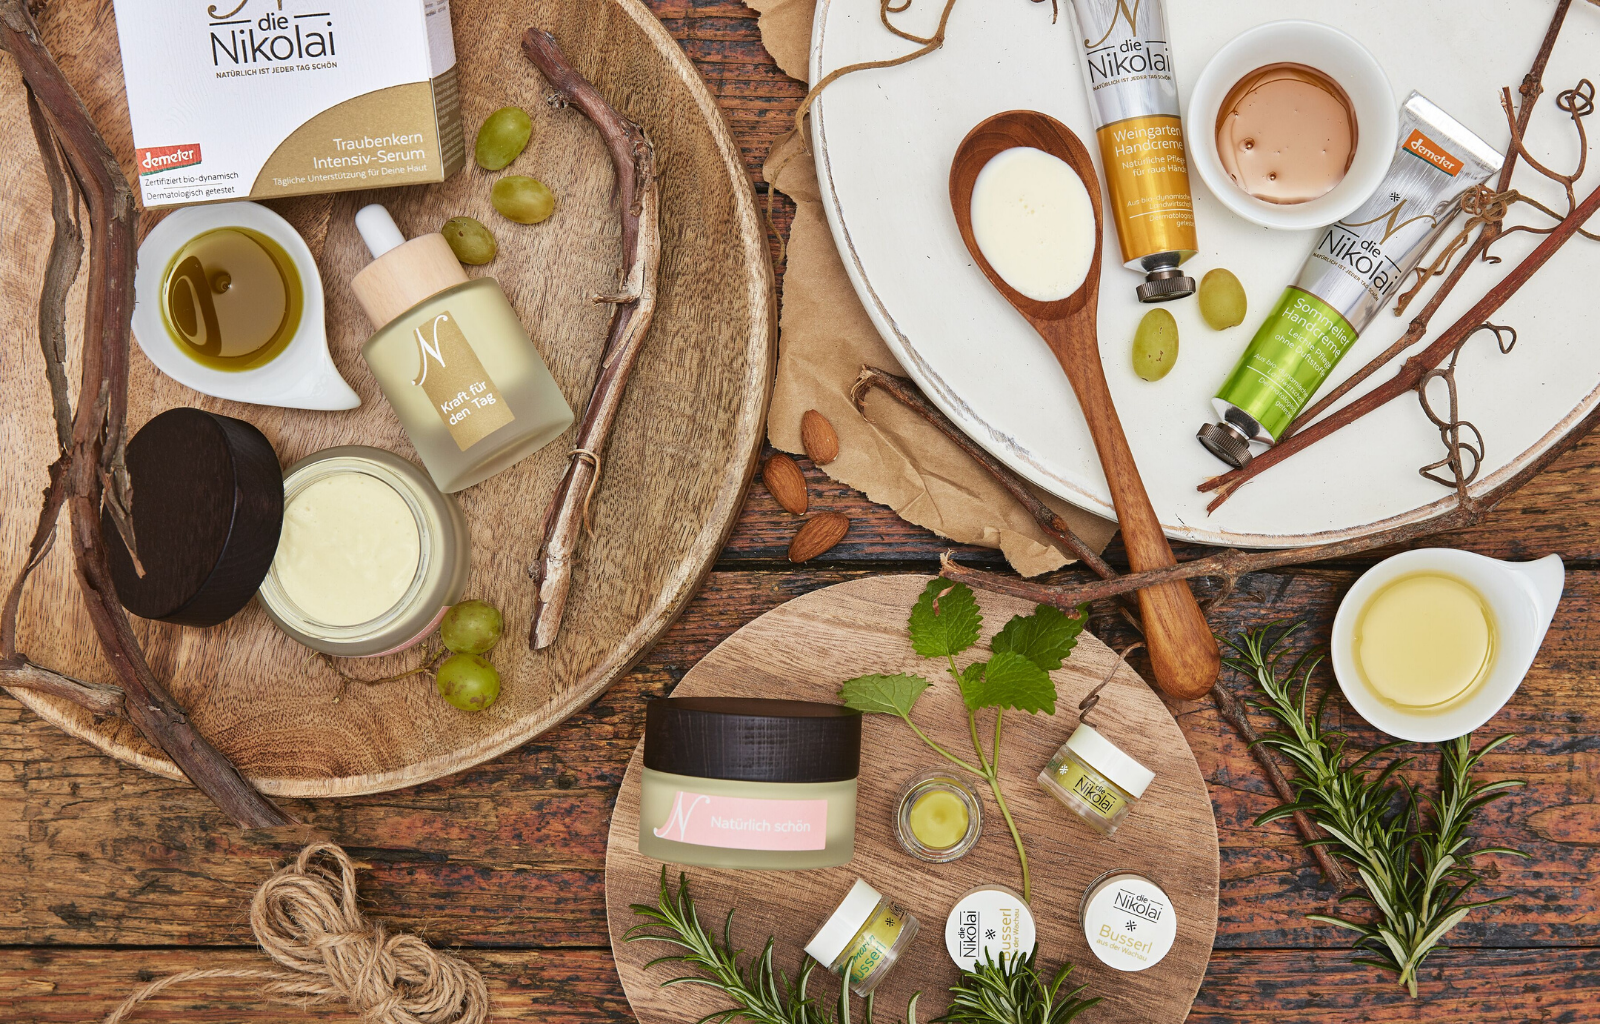 5 důvodů proč zvolit biodynamickou kosmetiku dieNikolai